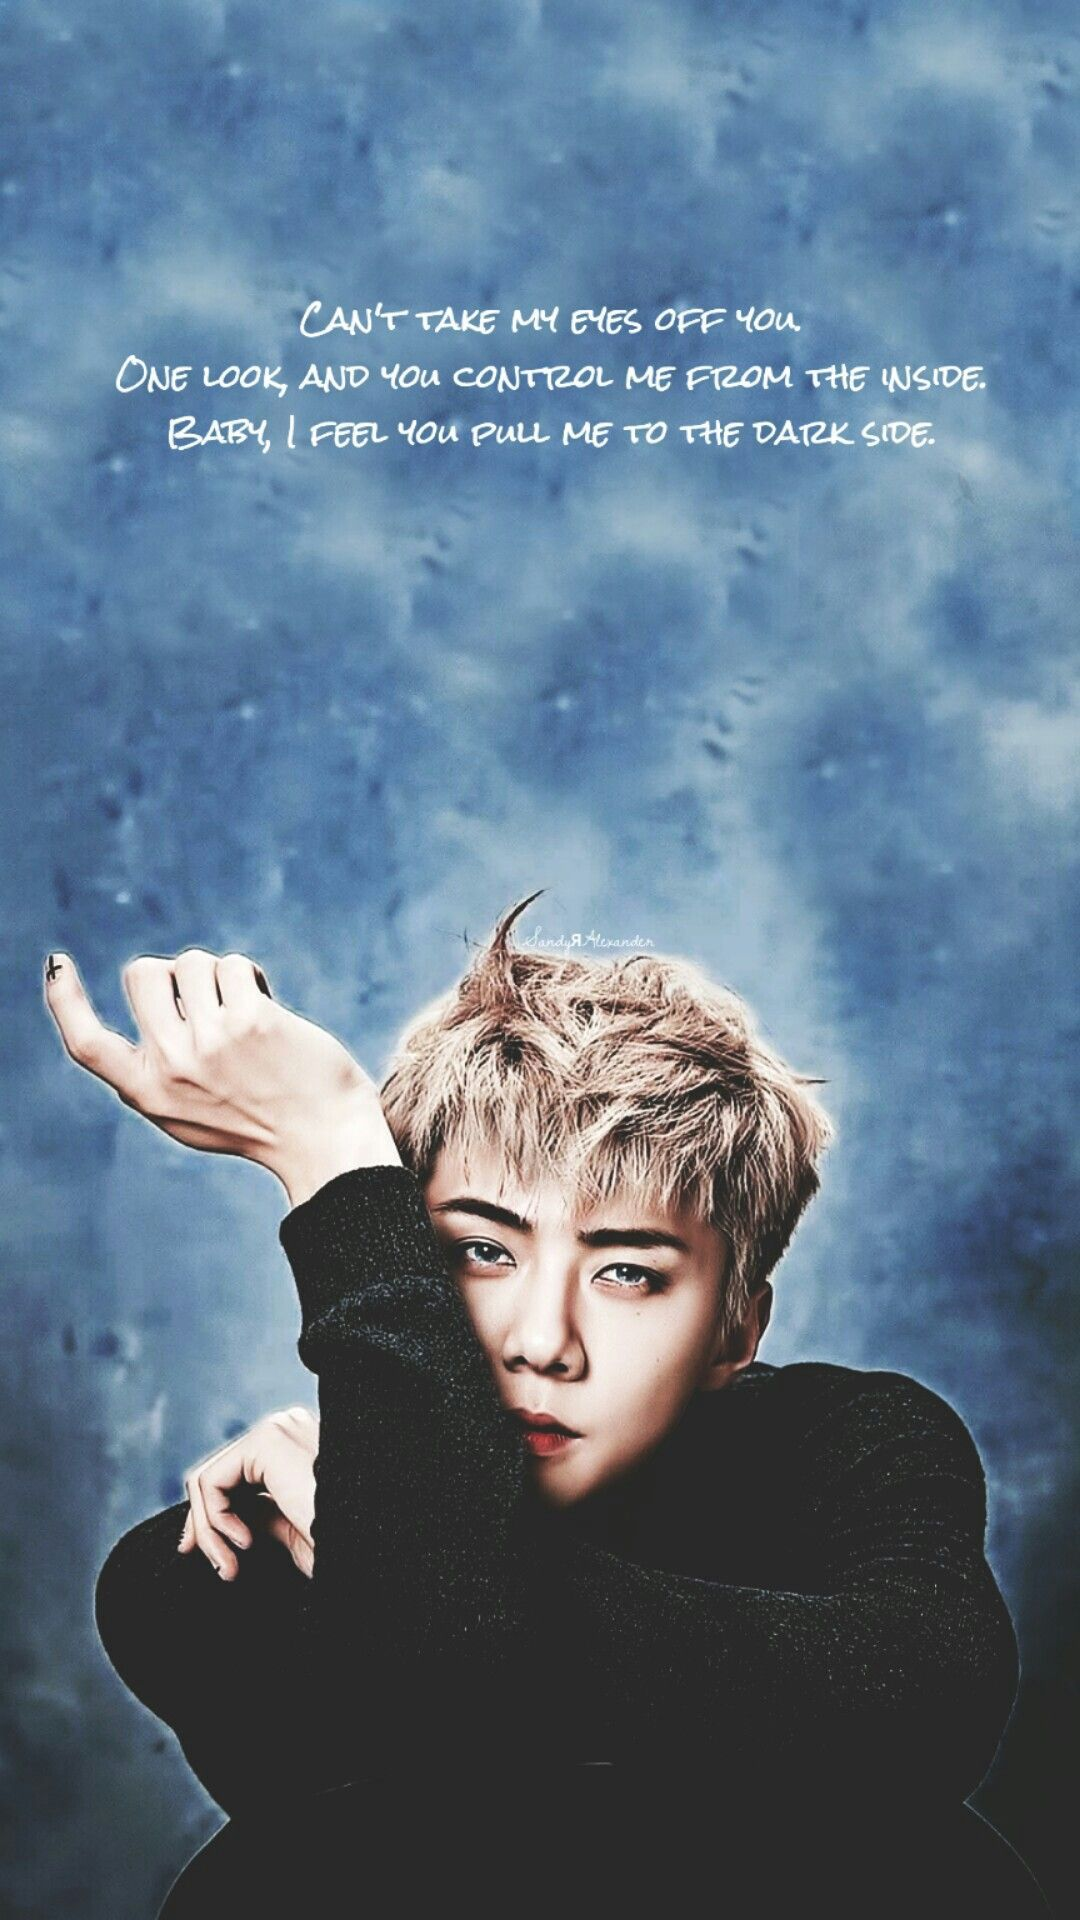 exo #wallpaper – #sehun – ♥ | Exo-L ♕♥ | Pinterest | Sehun, Exo …